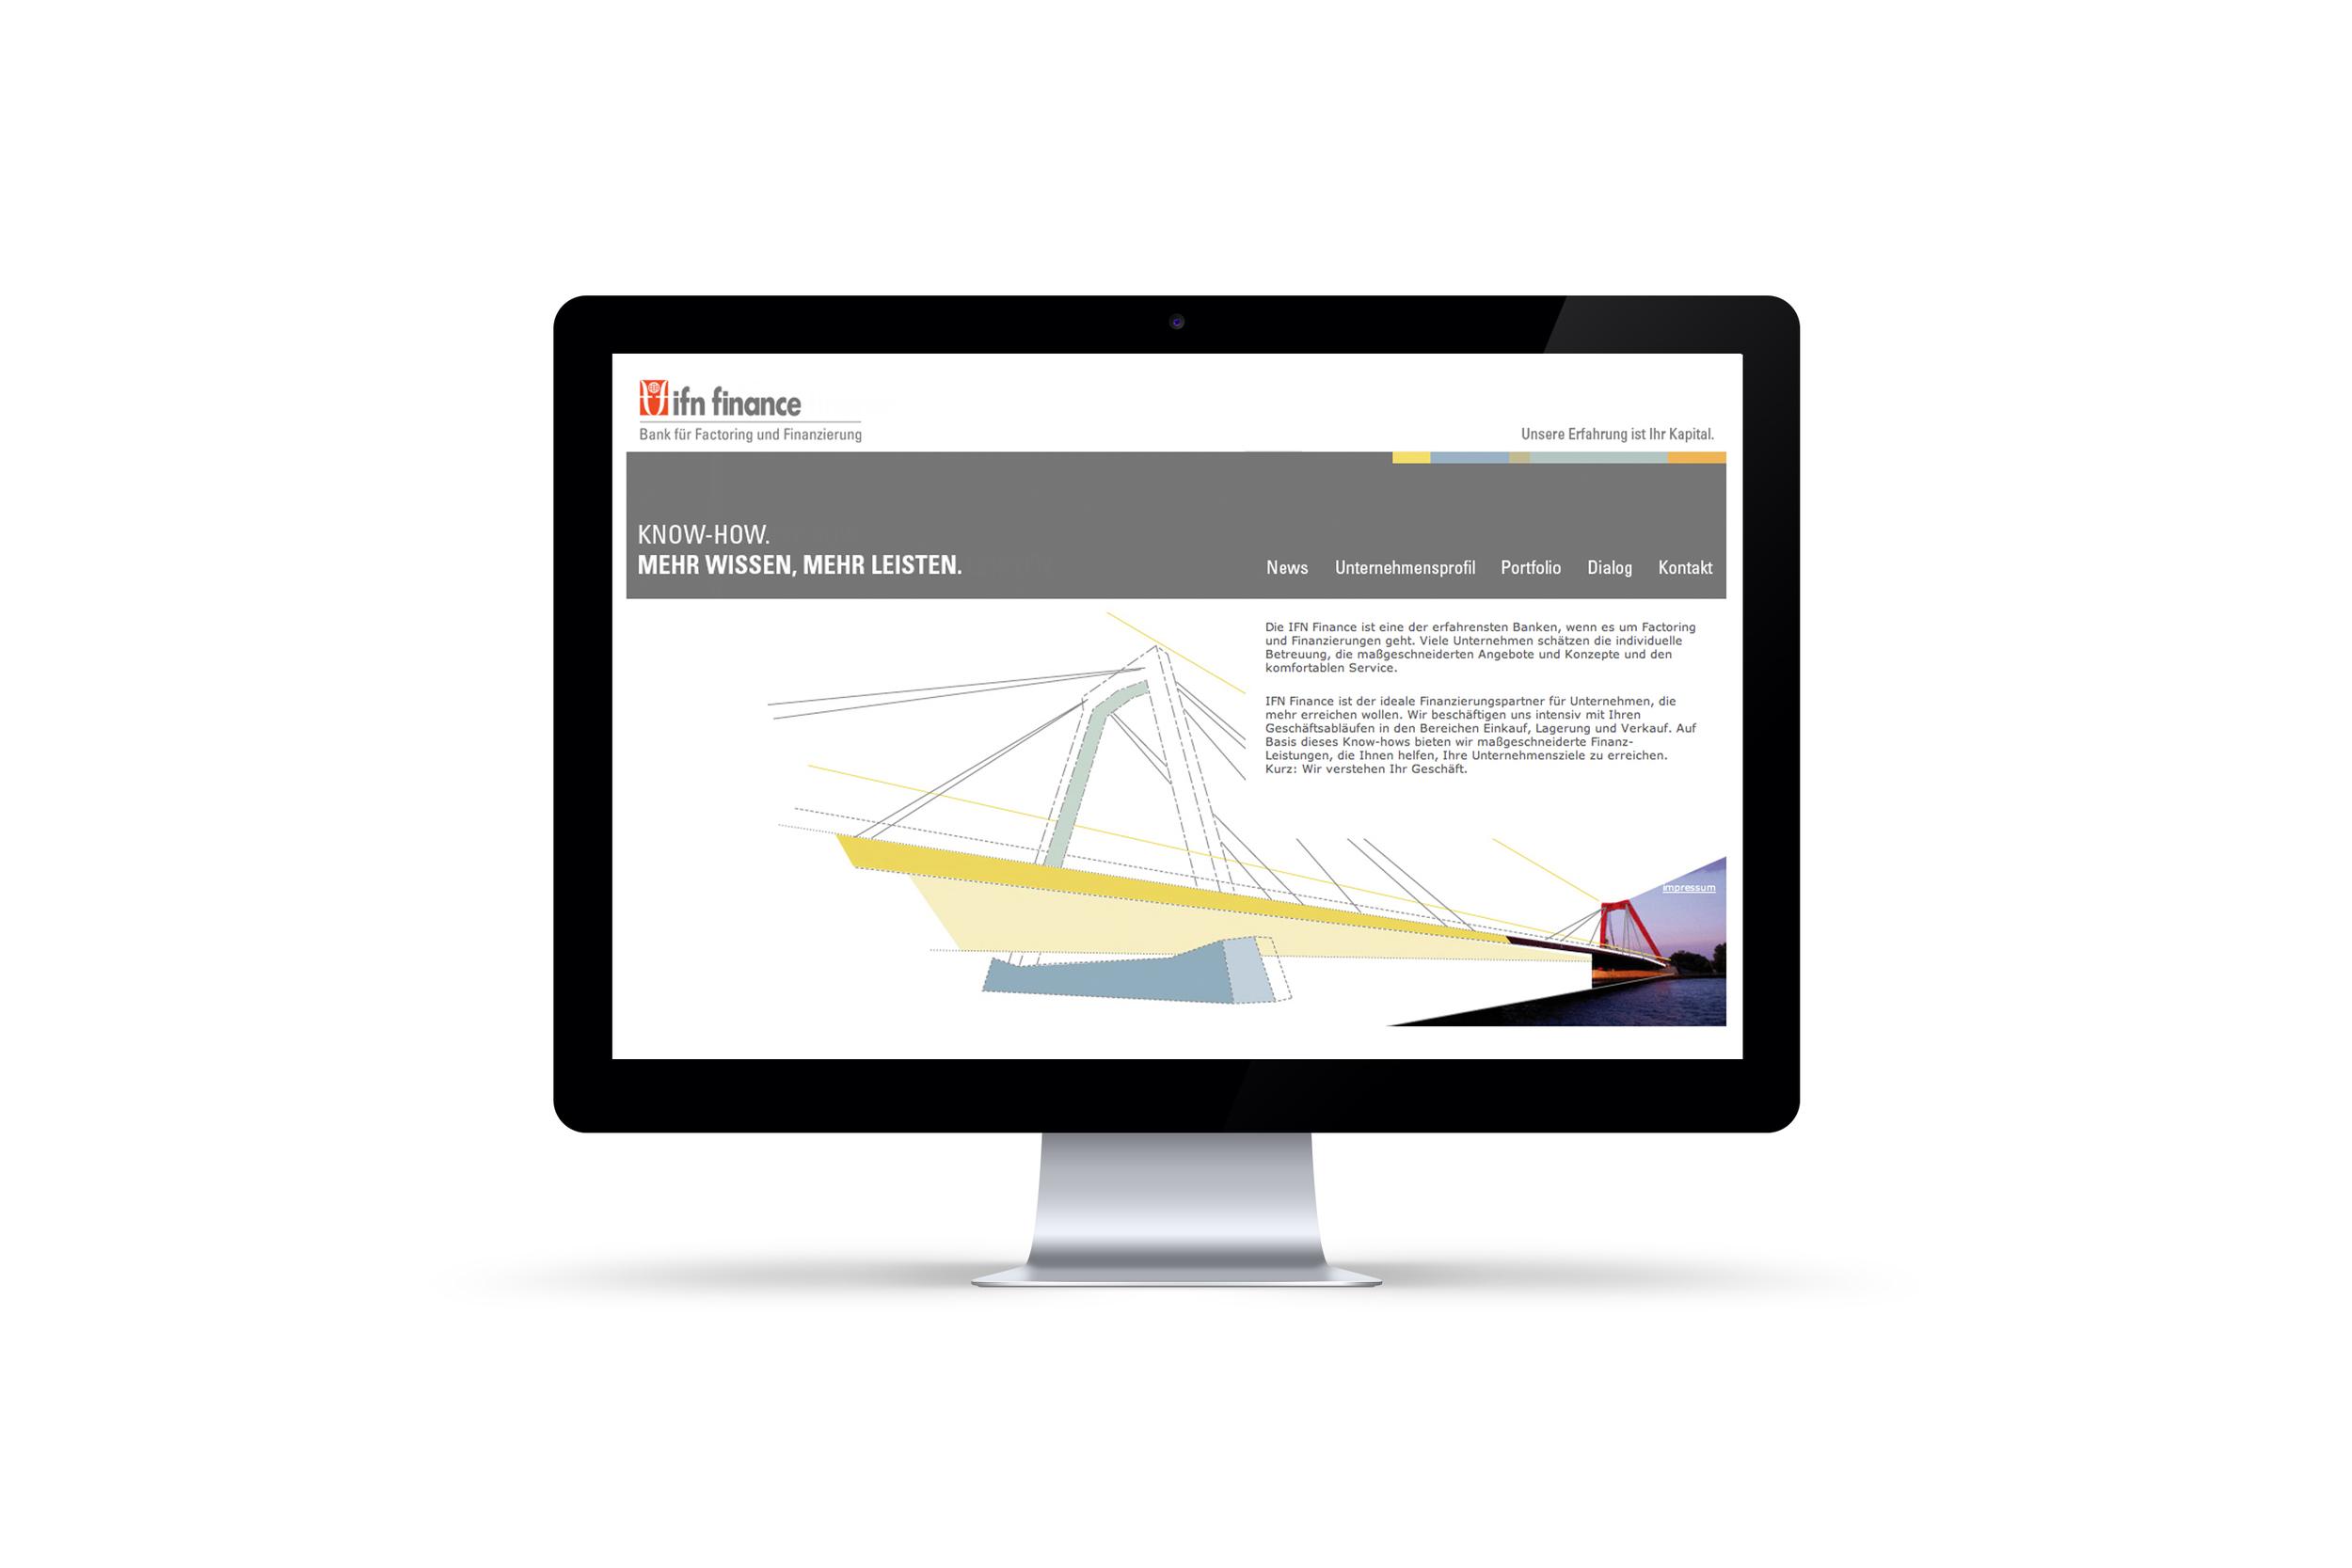 yellow_IFN_web.jpg